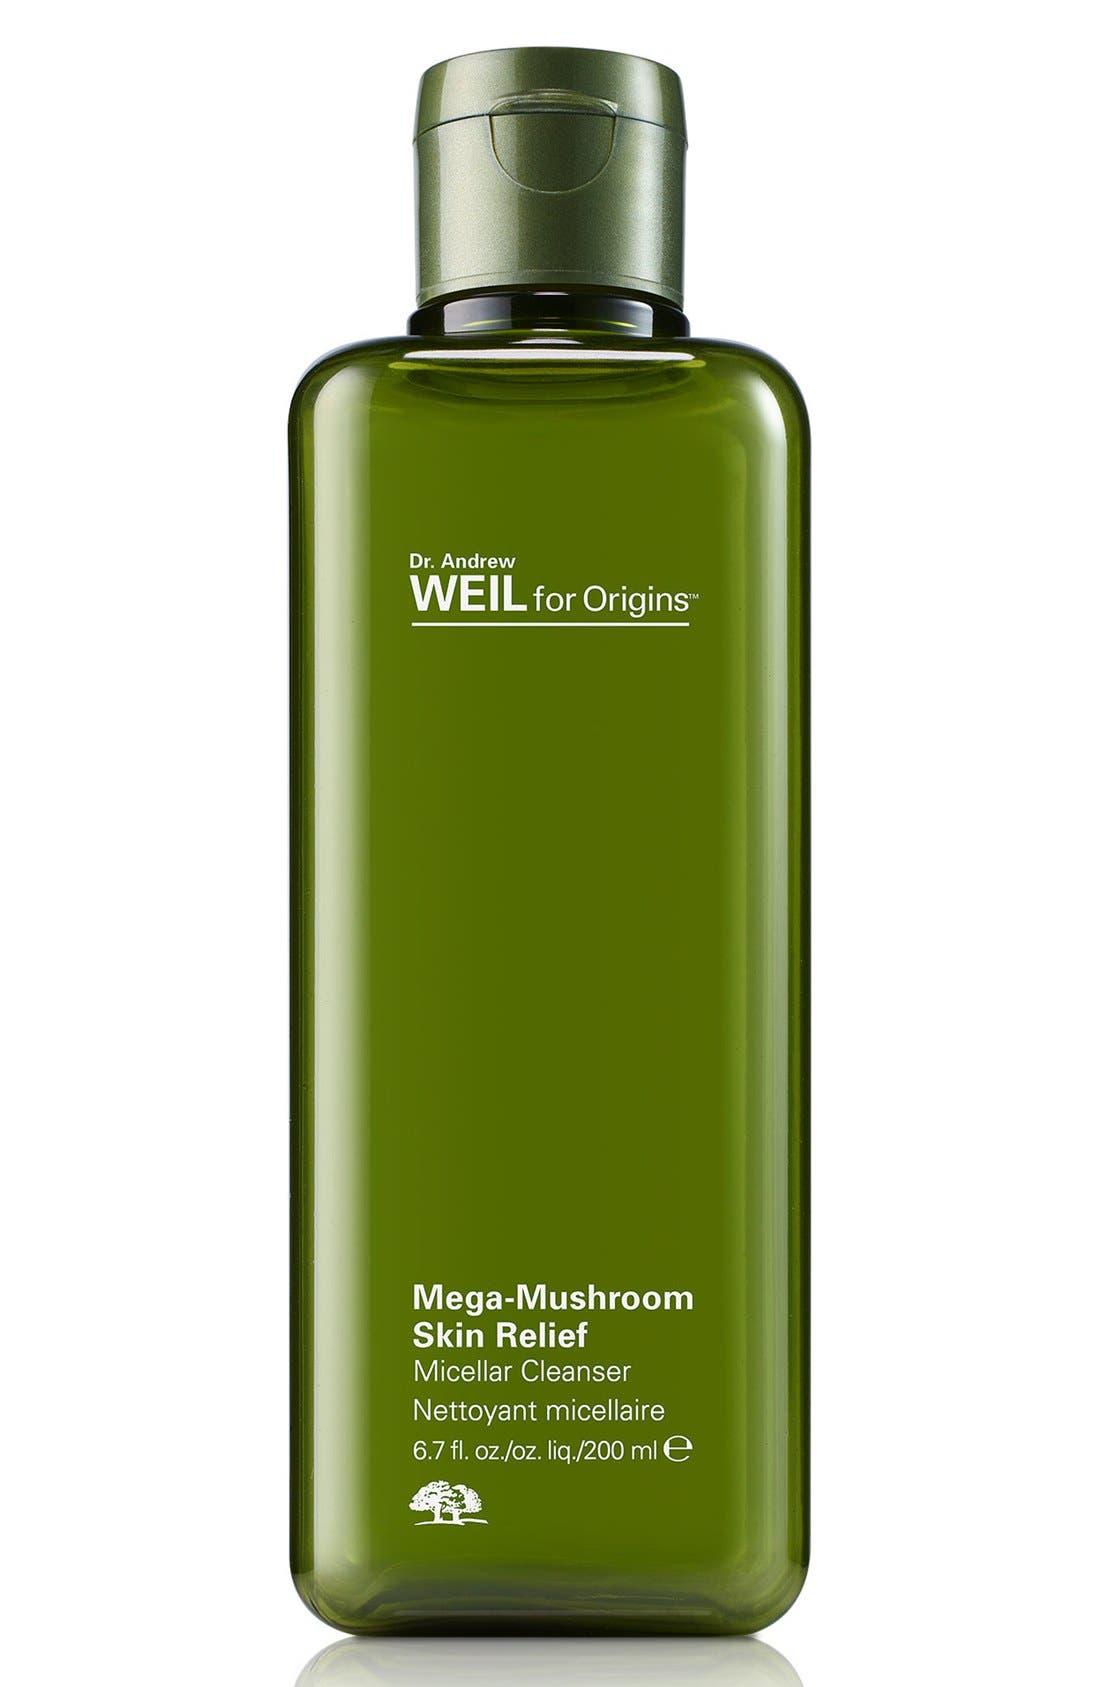 Origins Dr. Andrew Weil for Origins™ Mega-Mushroom Skin Relief Micellar Cleanser